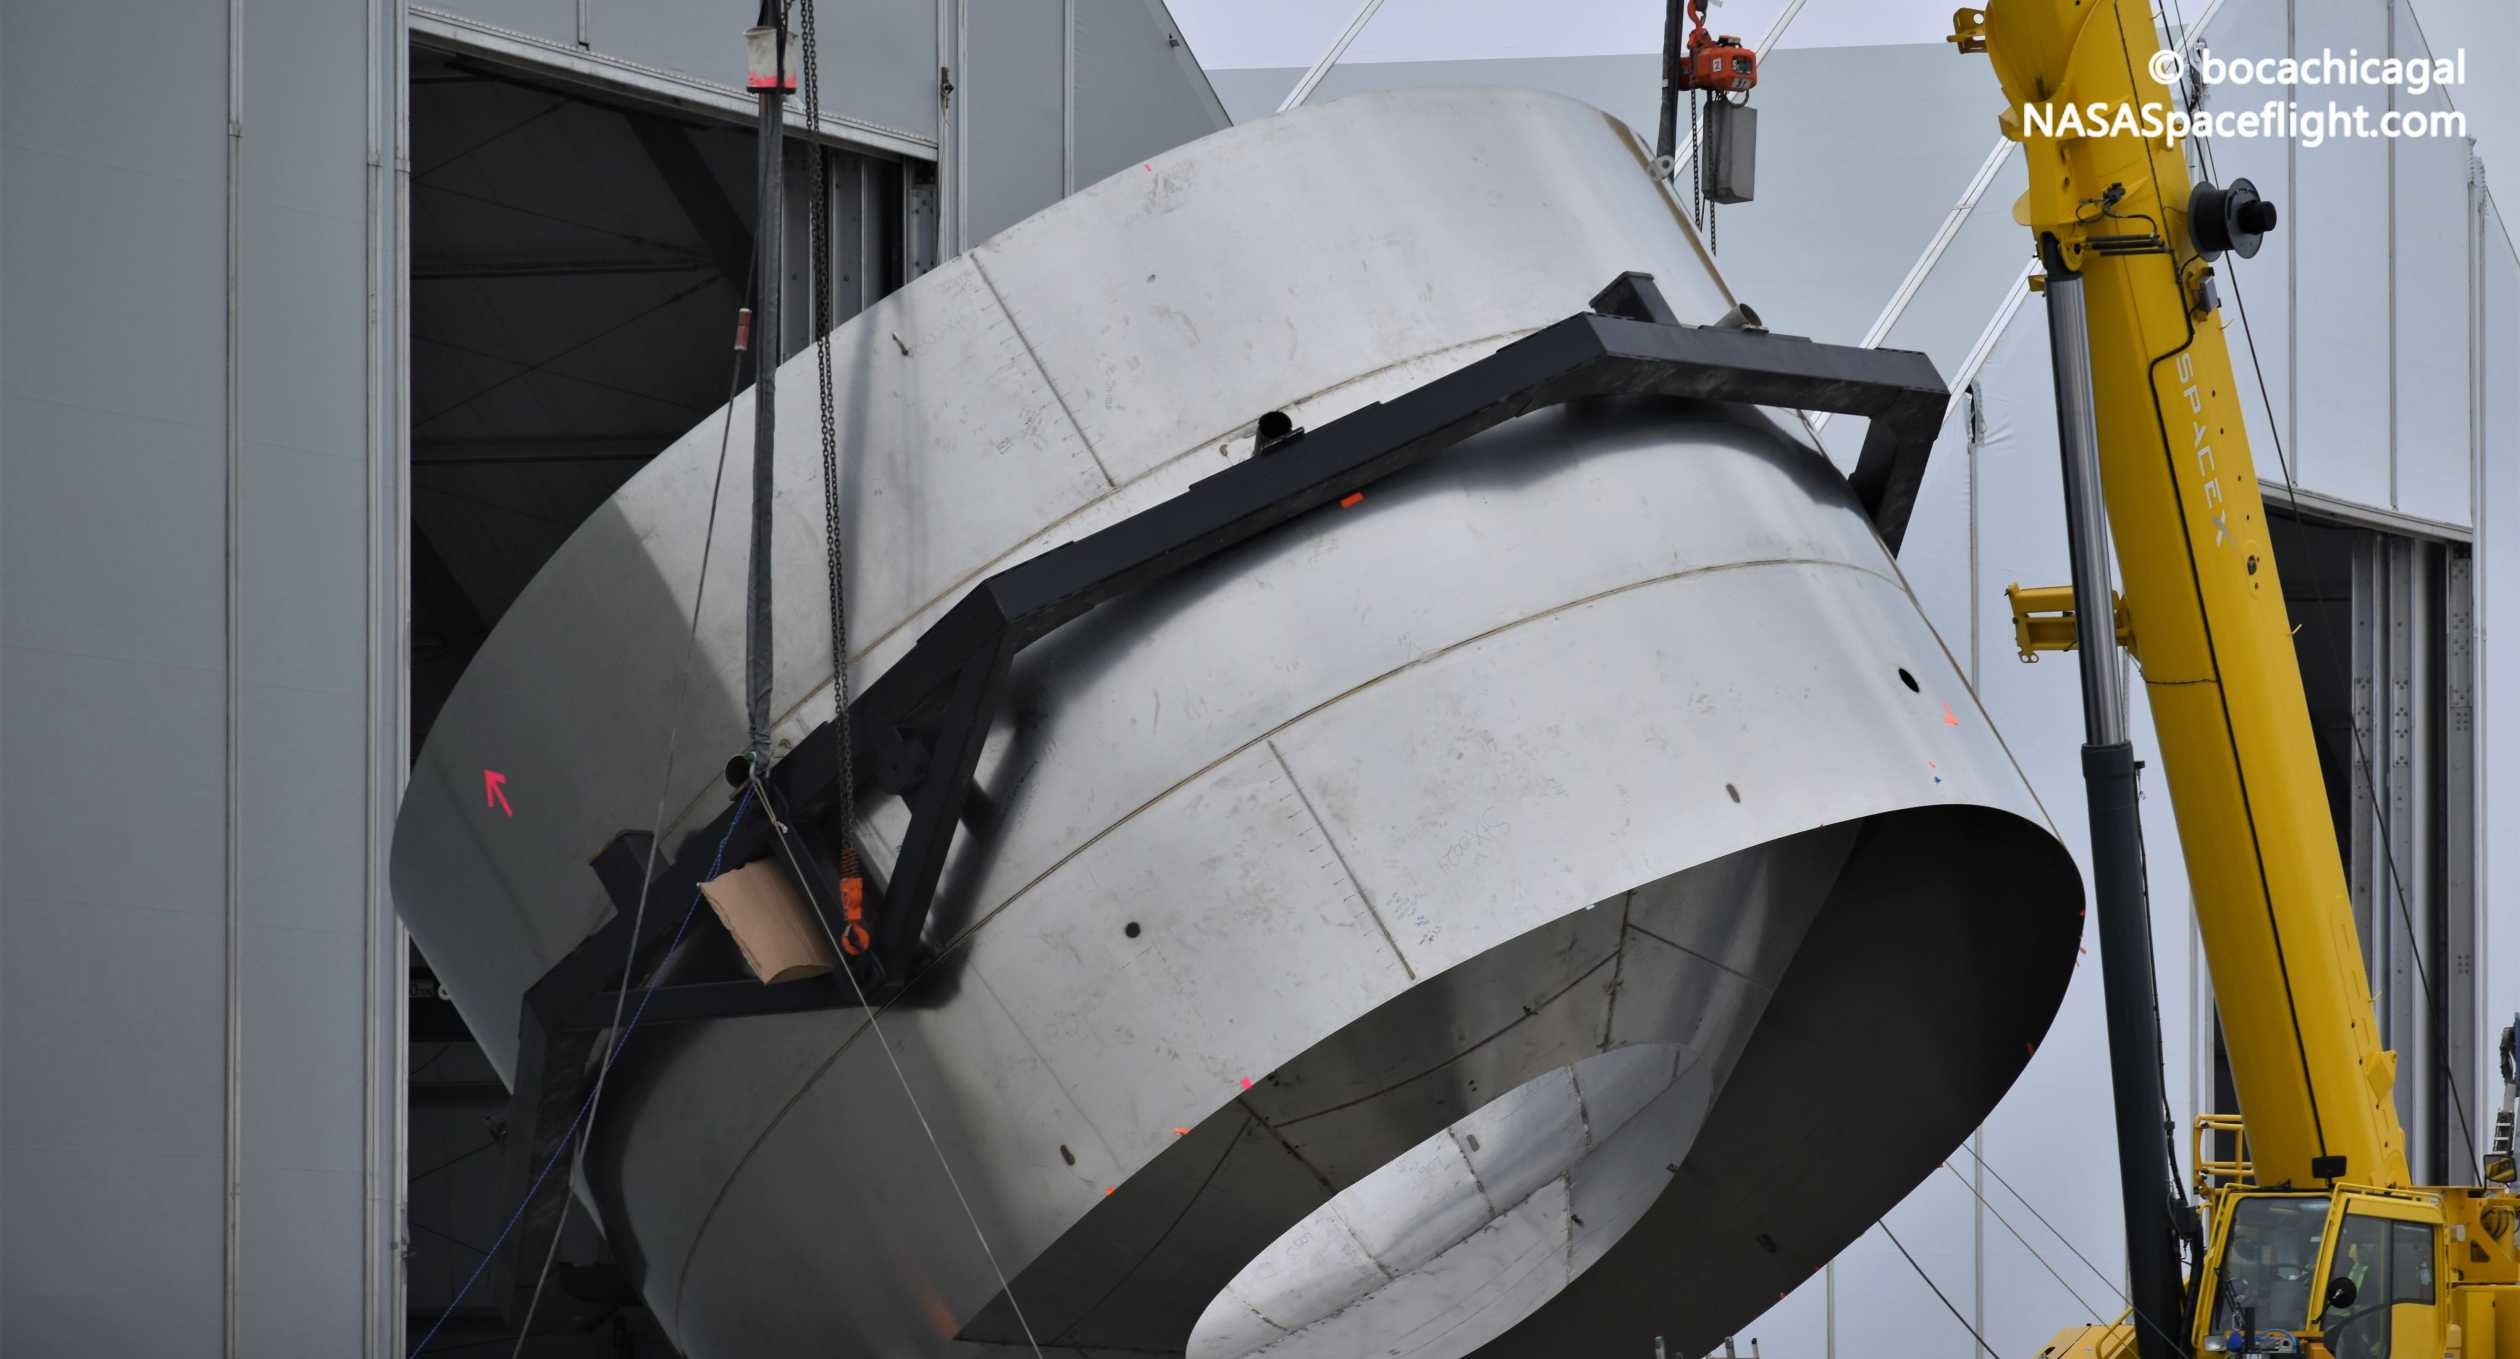 Starship Boca Chica 020920 (NASASpaceflight – bocachicagal) SN01 dome ring flip 6 crop (c)